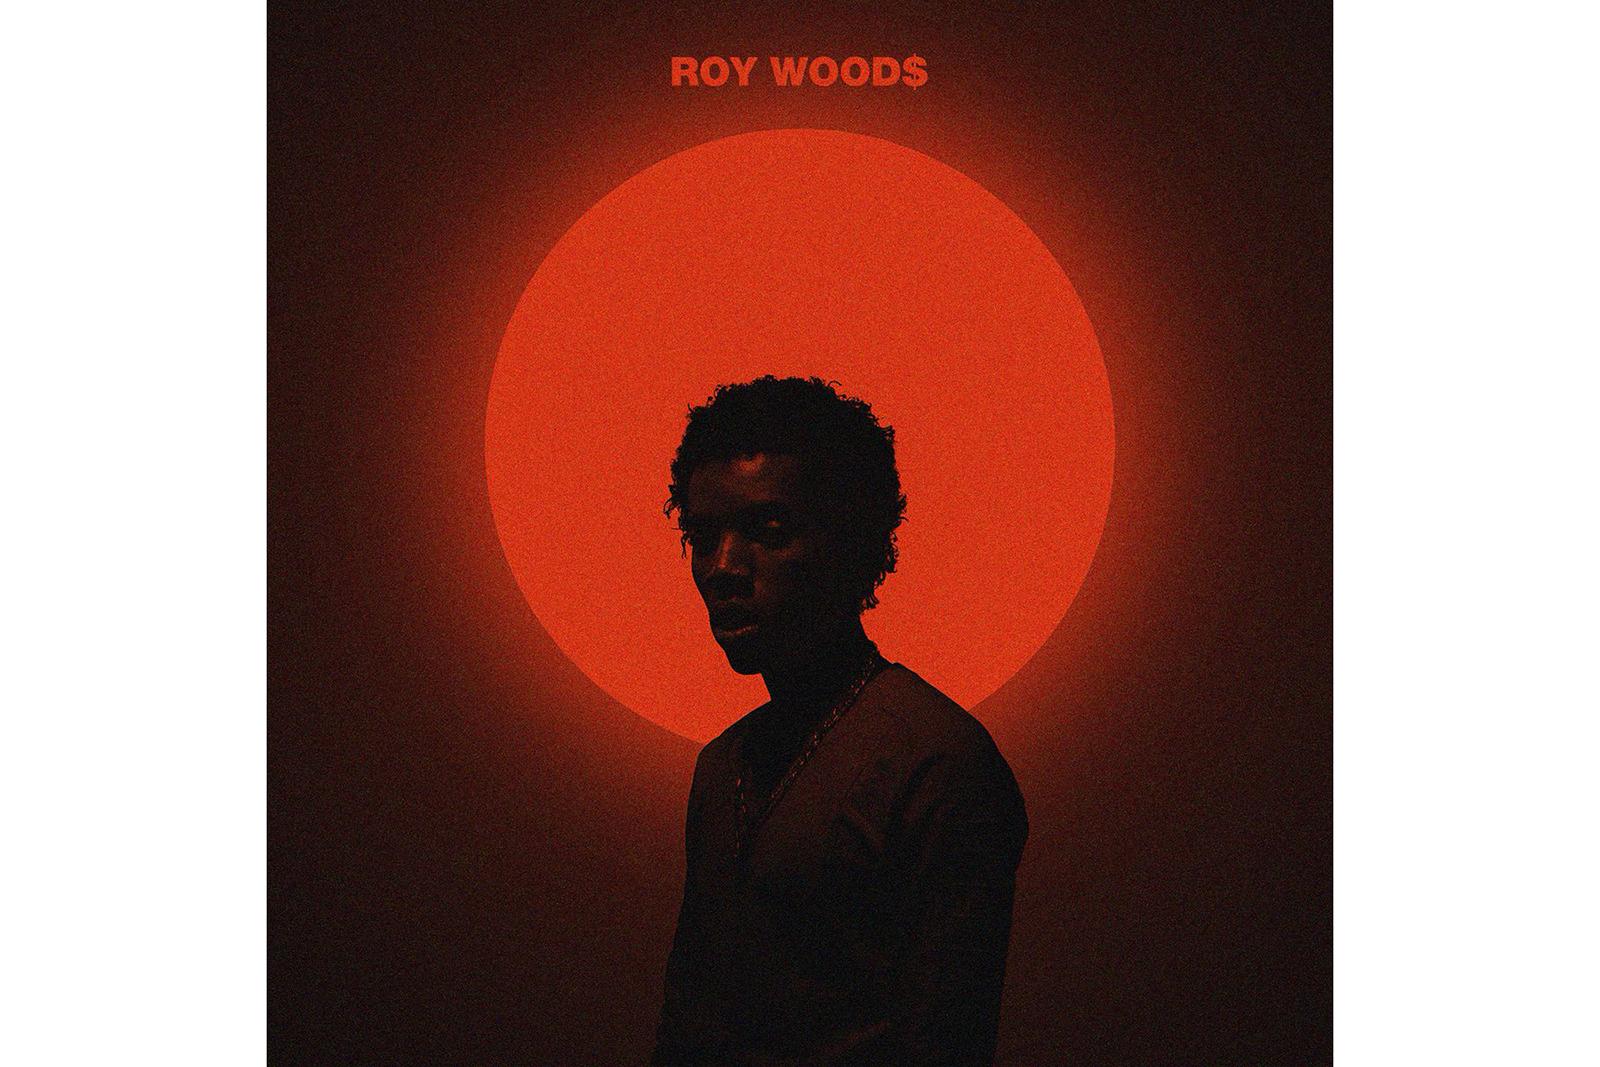 roy woods waking at dawn stream